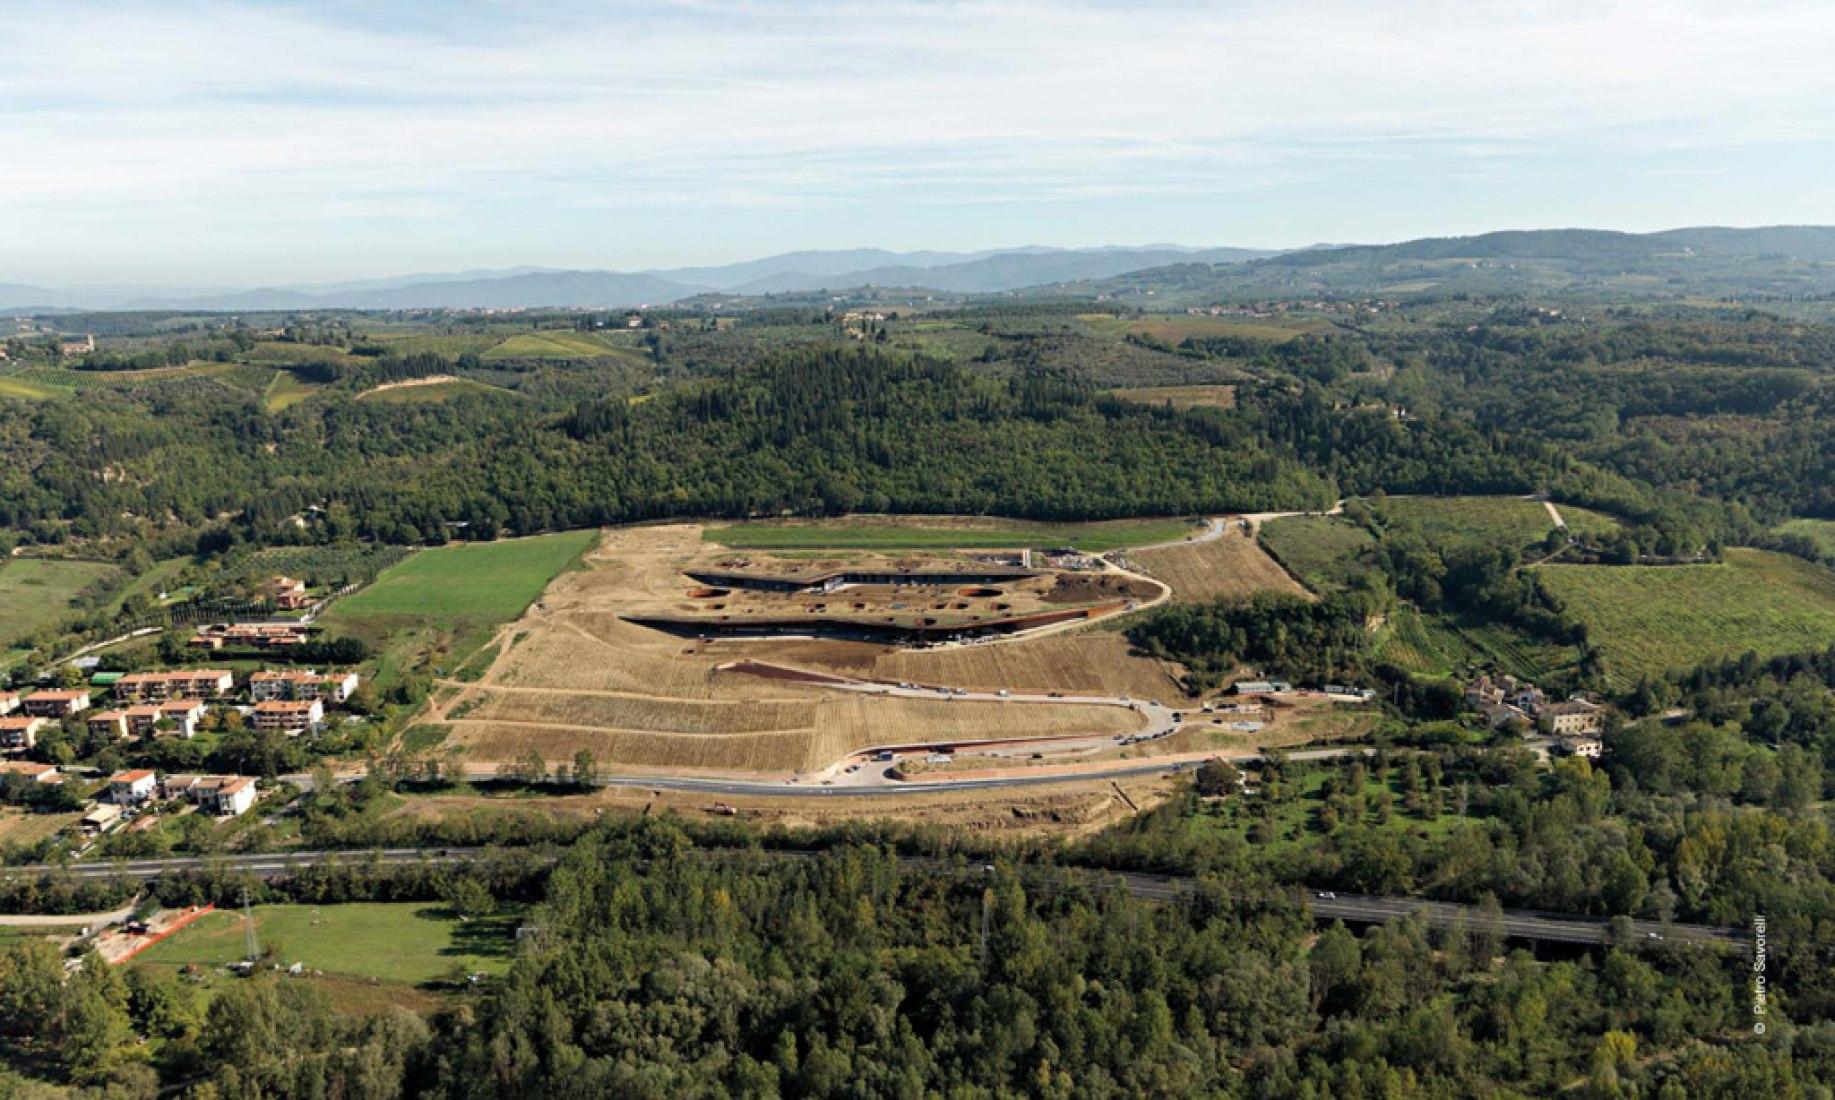 Overview, Antinori Winery by Archea Associati. Image © Pietro Savorelli.